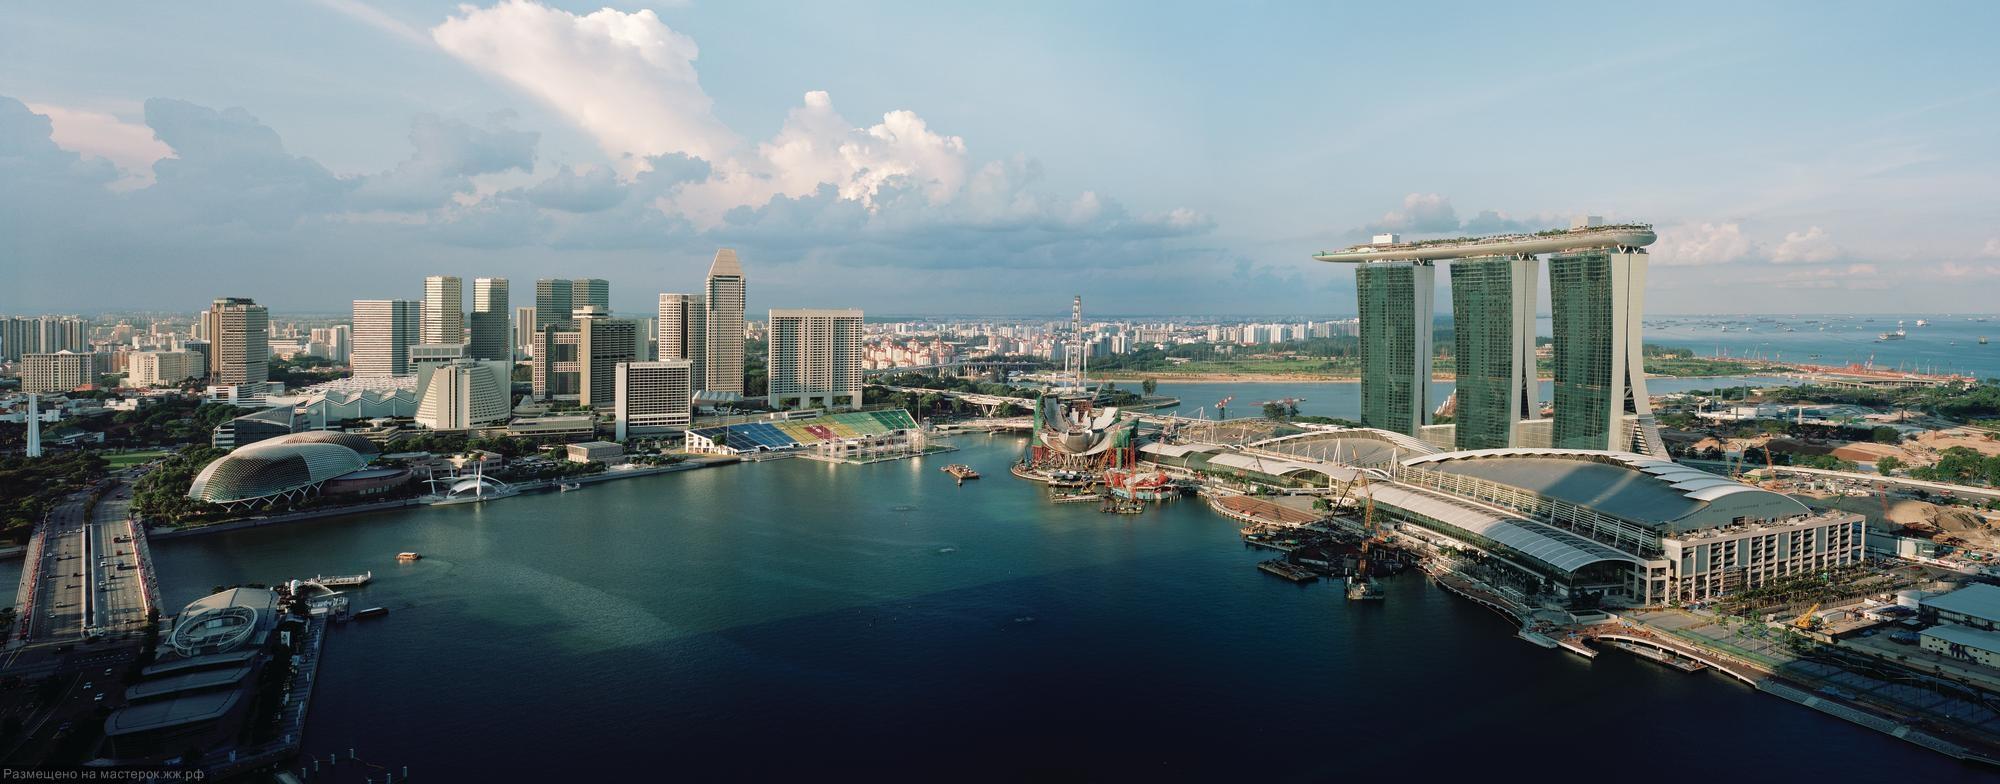 Marina Bay Sands Casino - Сингапур - TripAdvisor